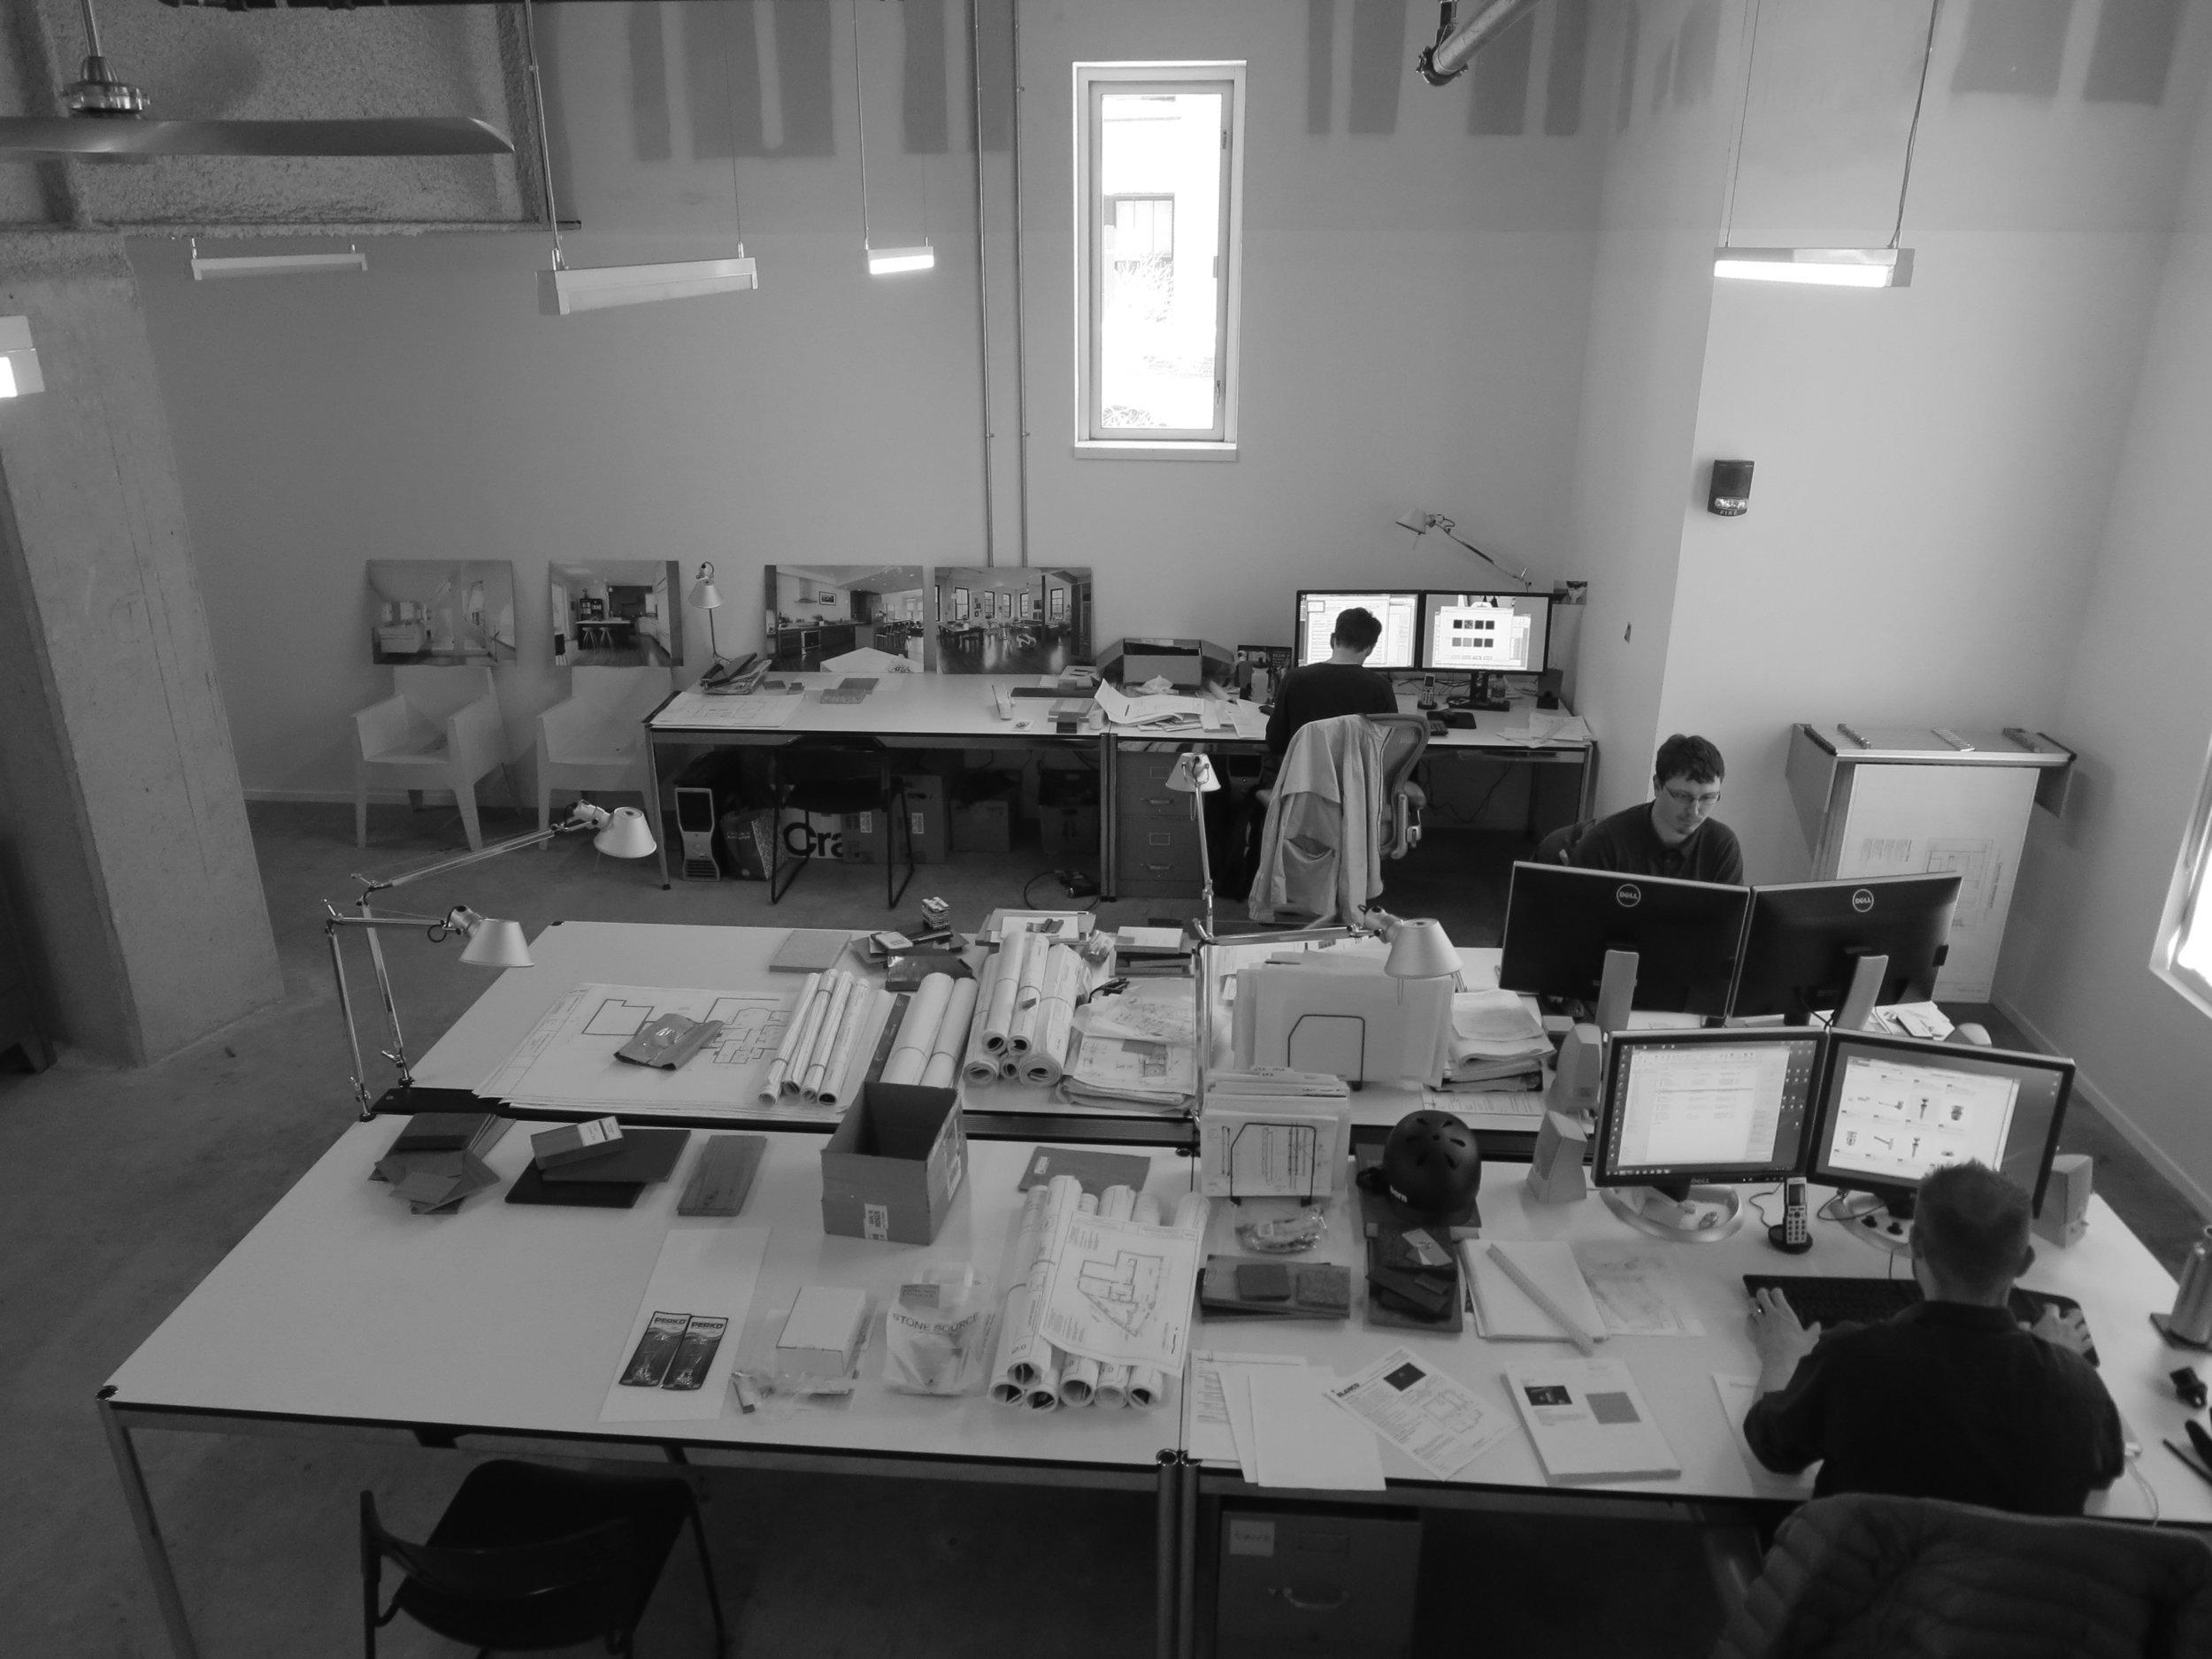 kennard architects office 1 - bw.jpg